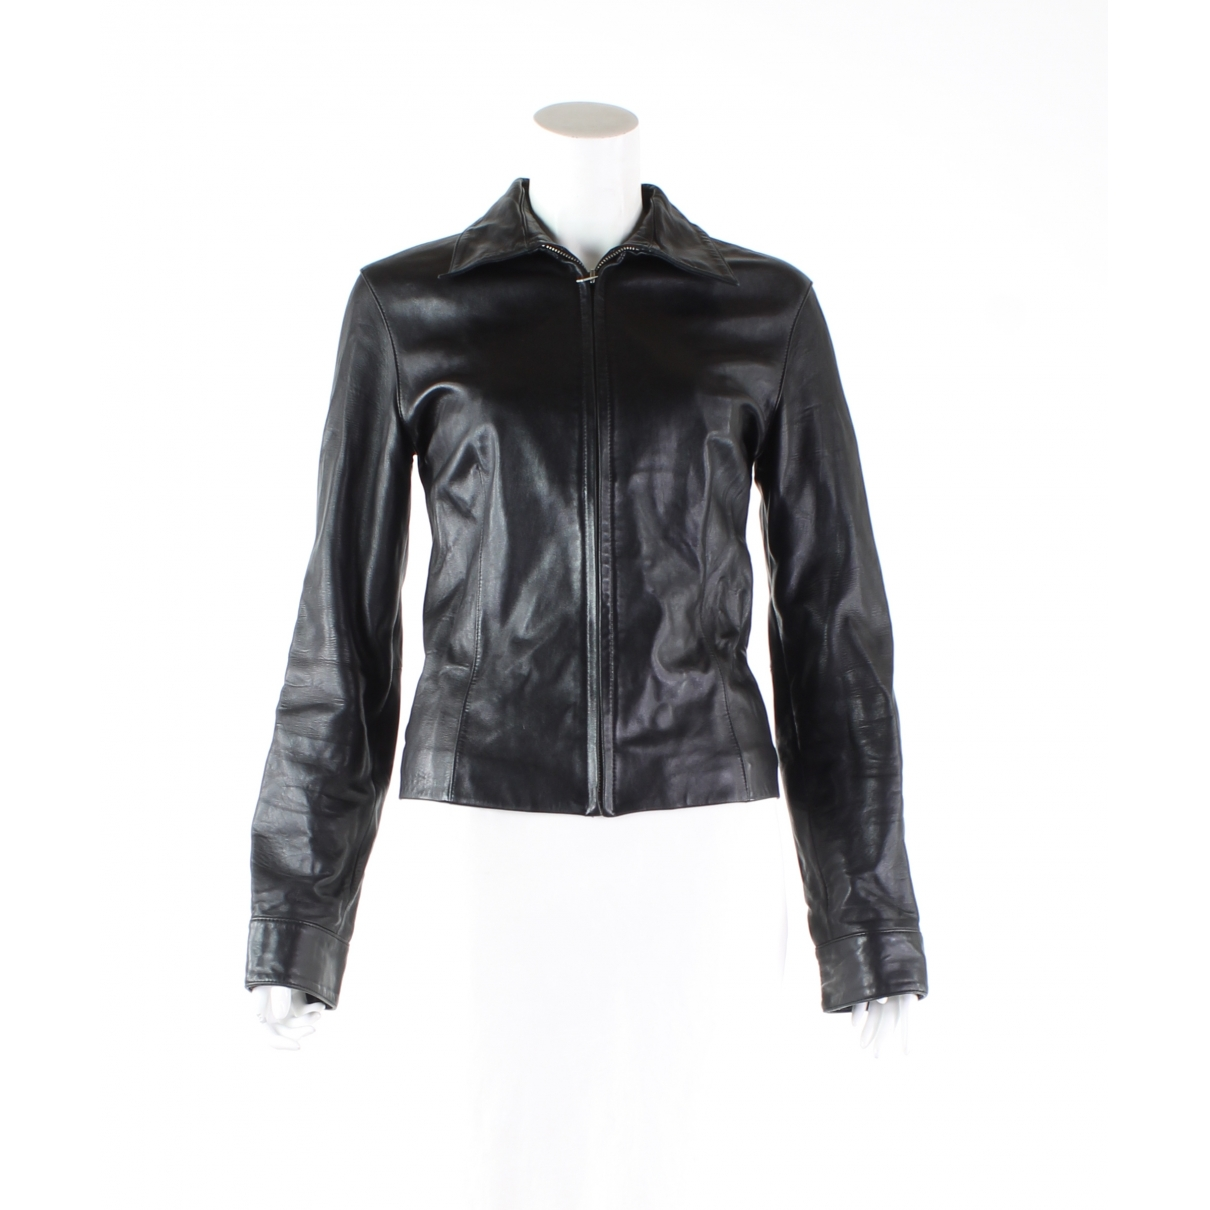 Calvin Klein \N Black Leather jacket for Women M International